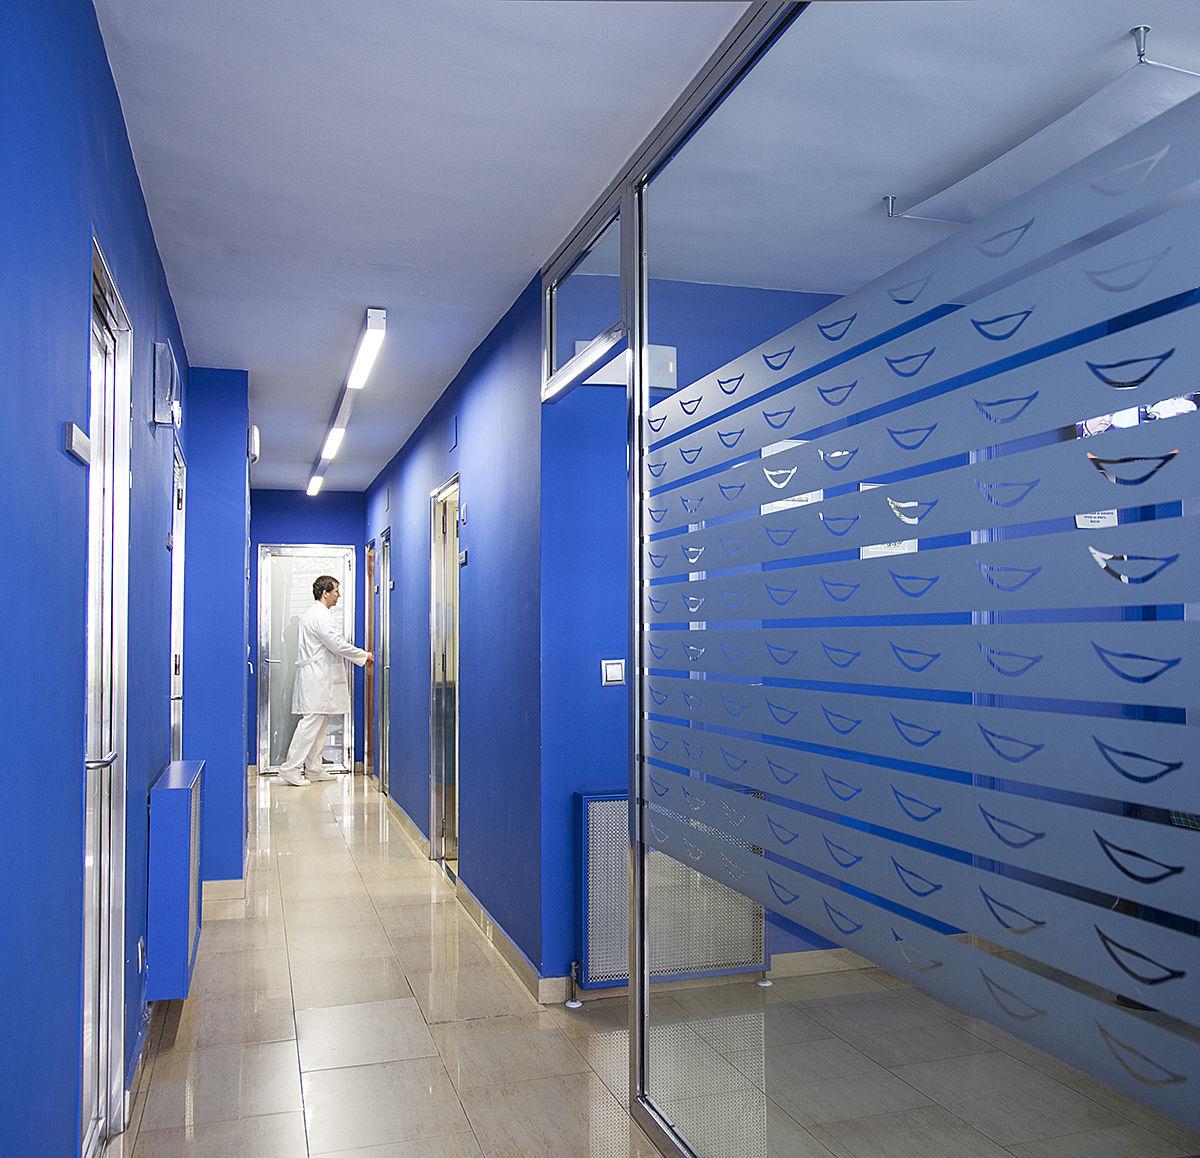 Foto 2 de Clínicas dentales en Santurtzi | Centro Dental Bizkai-Dent